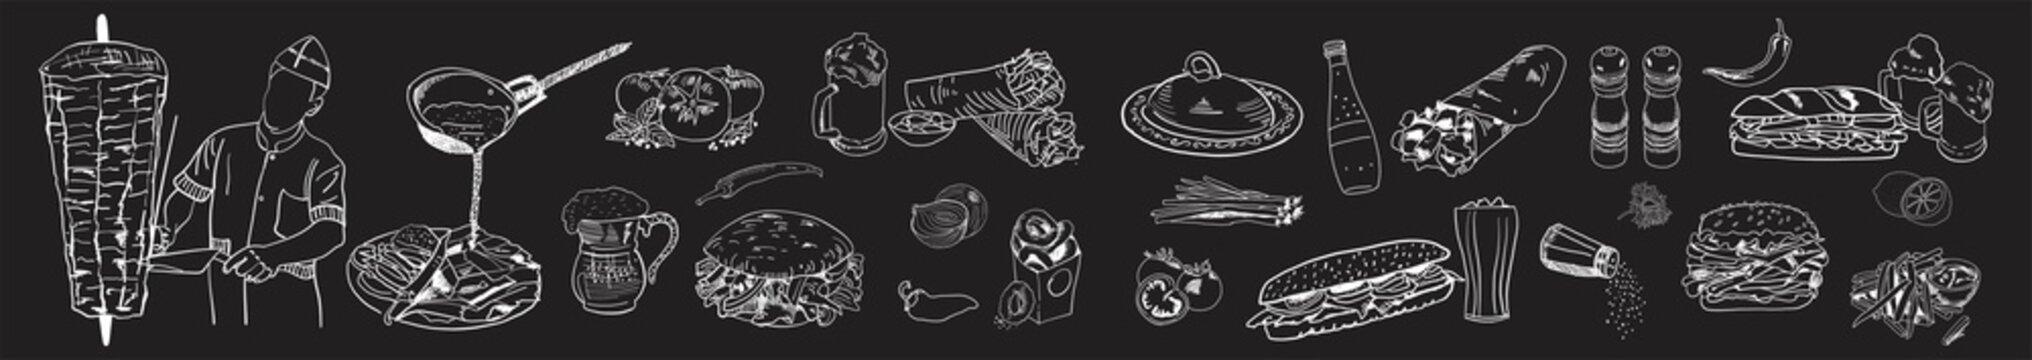 Doner kebab cooking and ingredients for kebab. Shawarma hand drawn. Fast food menu design elements. Restaurant cafe template design. Vector.